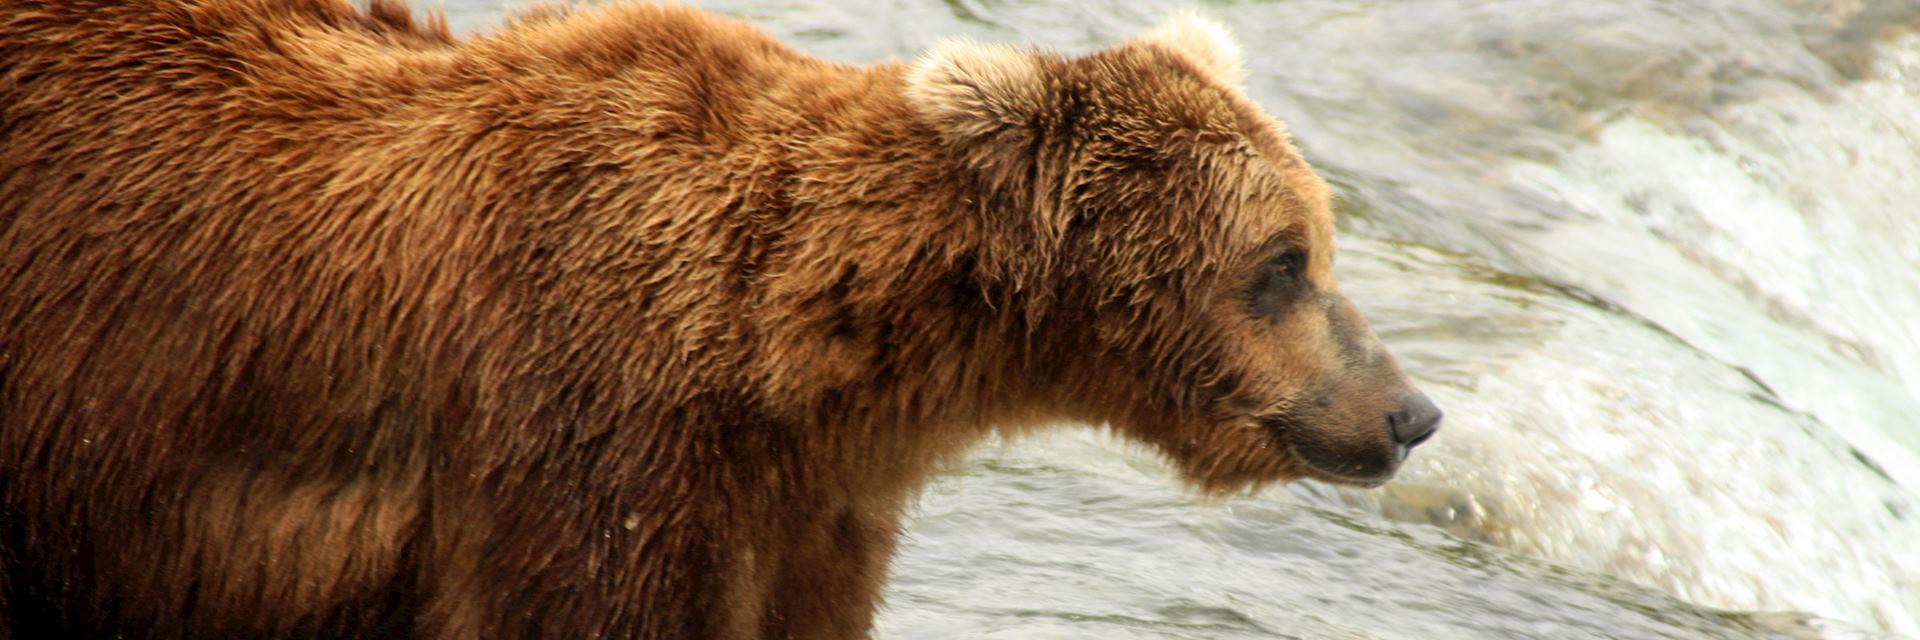 Grizzly bear, Brooks Falls, Katmai National Park